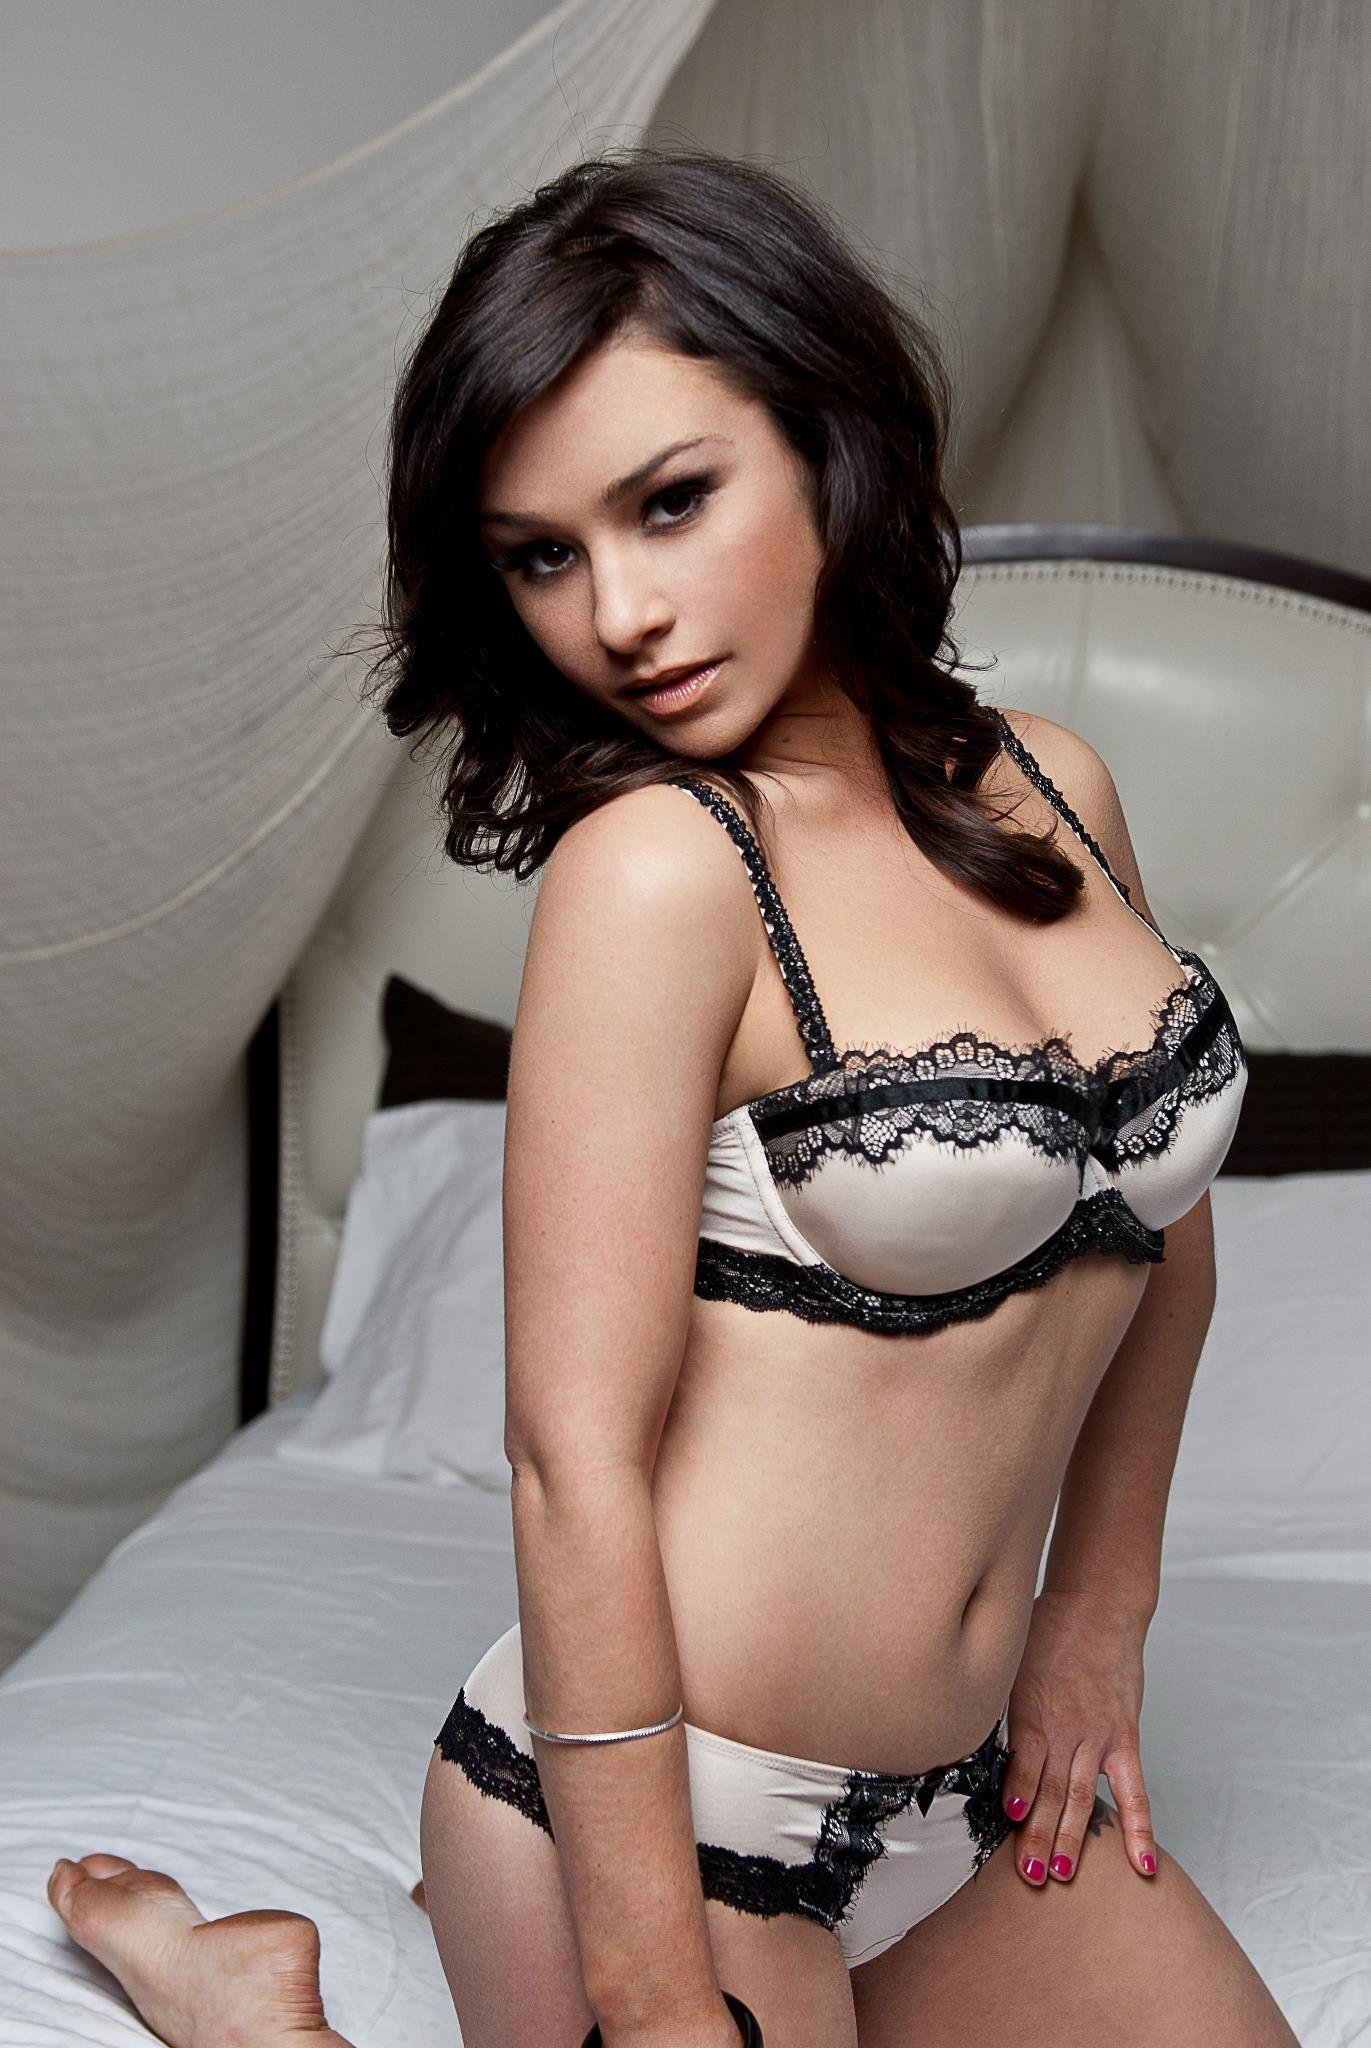 Readhead pussy and tits up close